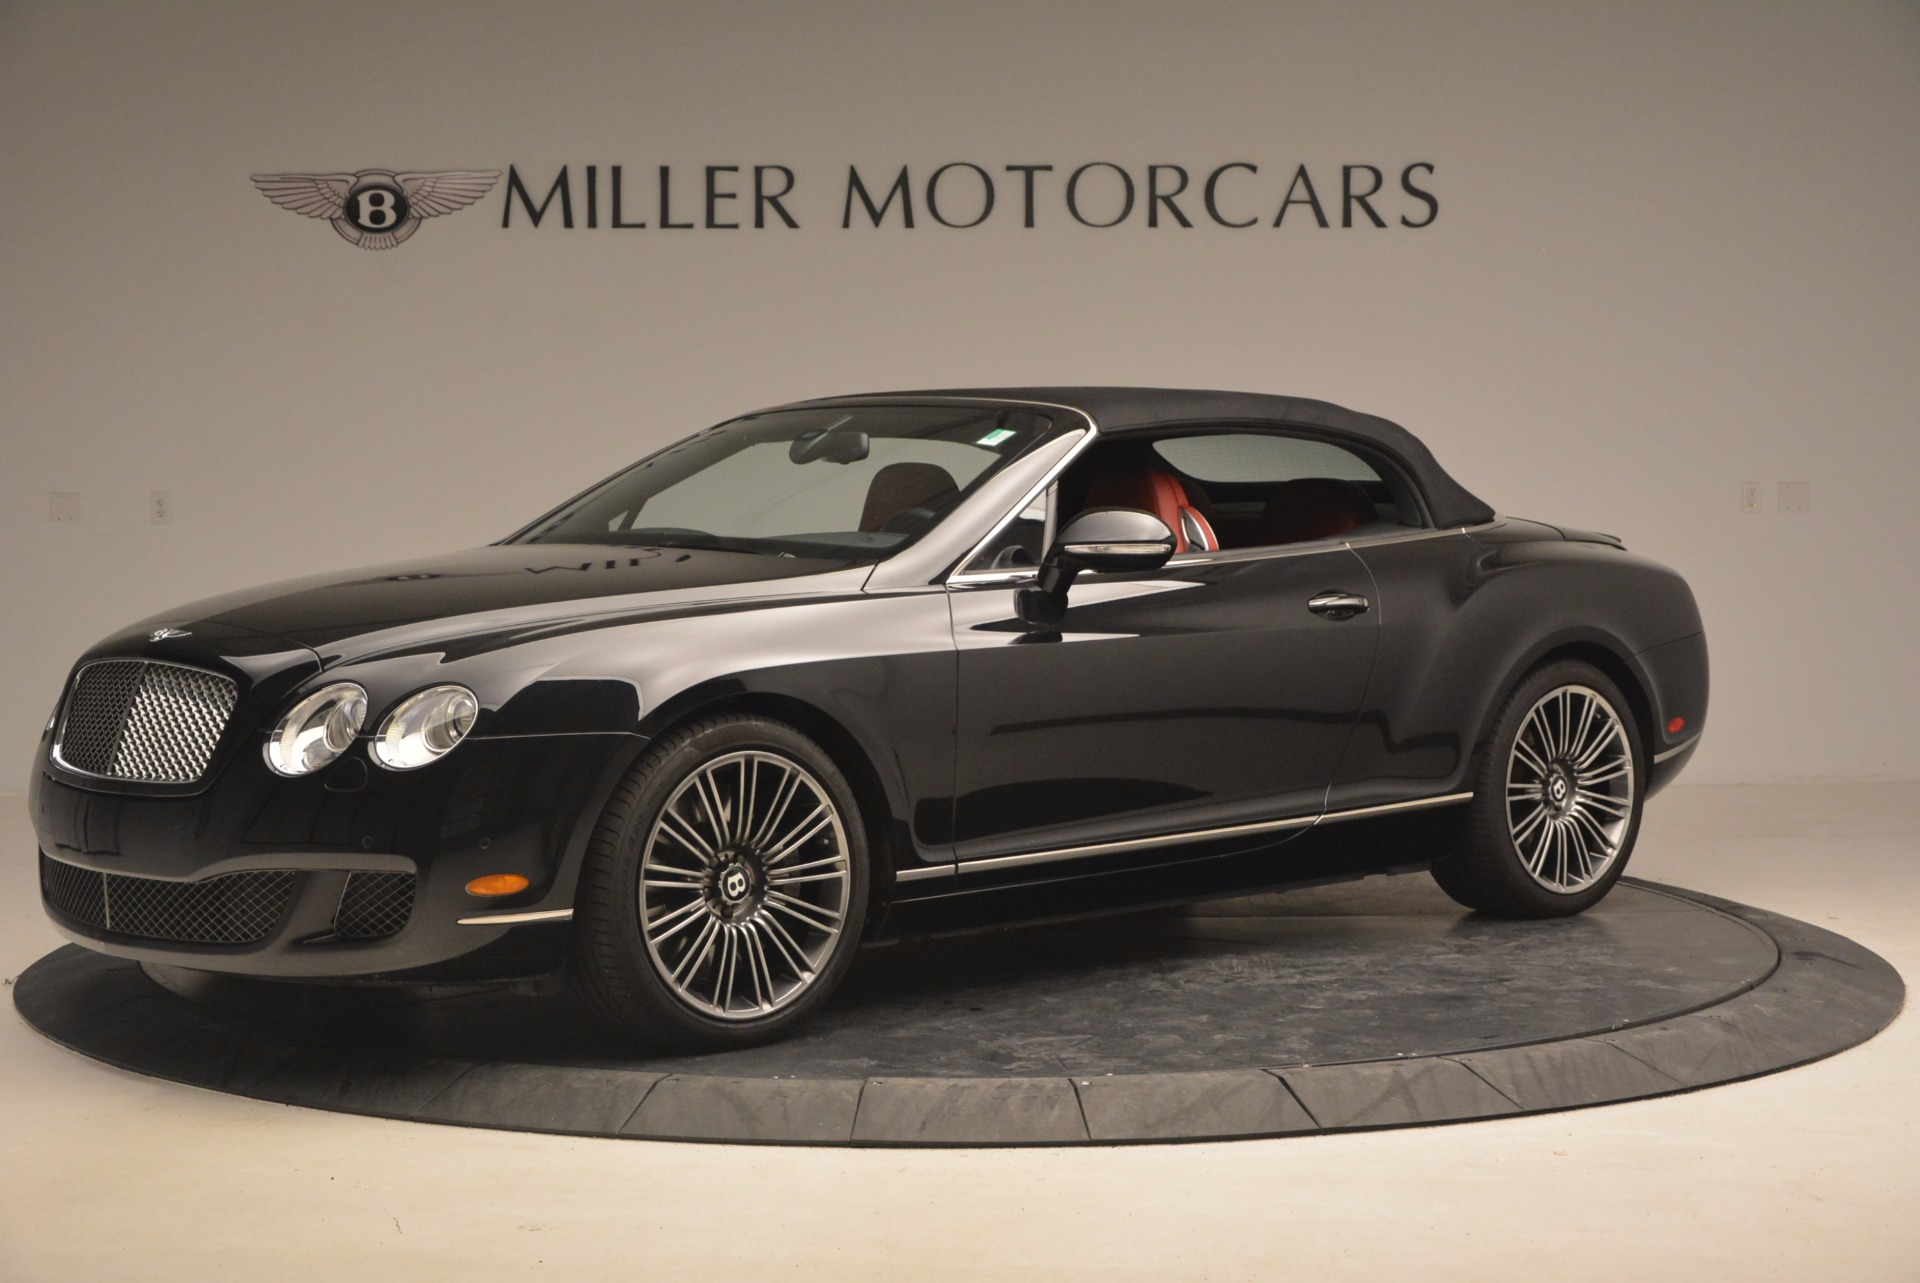 Used 2010 Bentley Continental GT Speed For Sale In Westport, CT 1298_p15